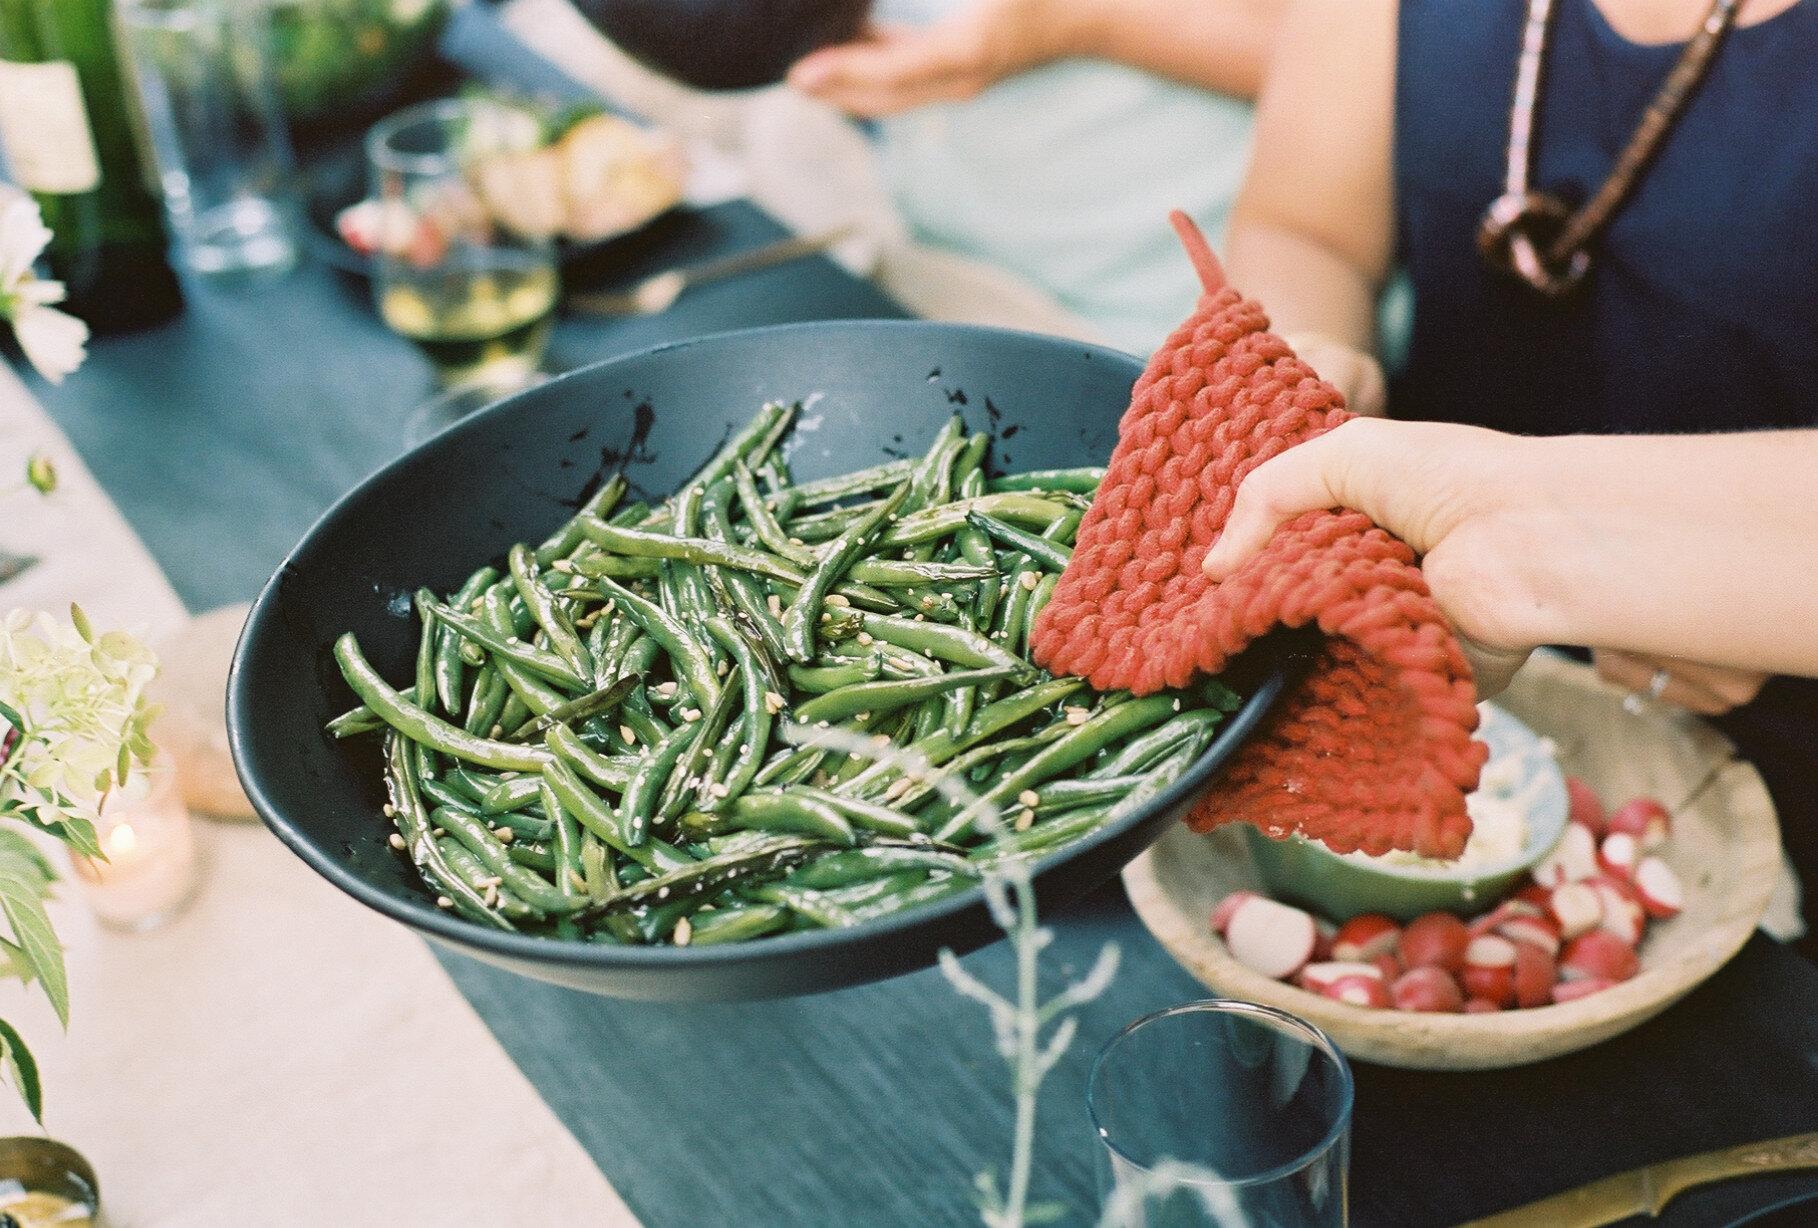 Sesame Green Beans Dinner Radish Workshop Chef Tess Palma-Martinez.jpg